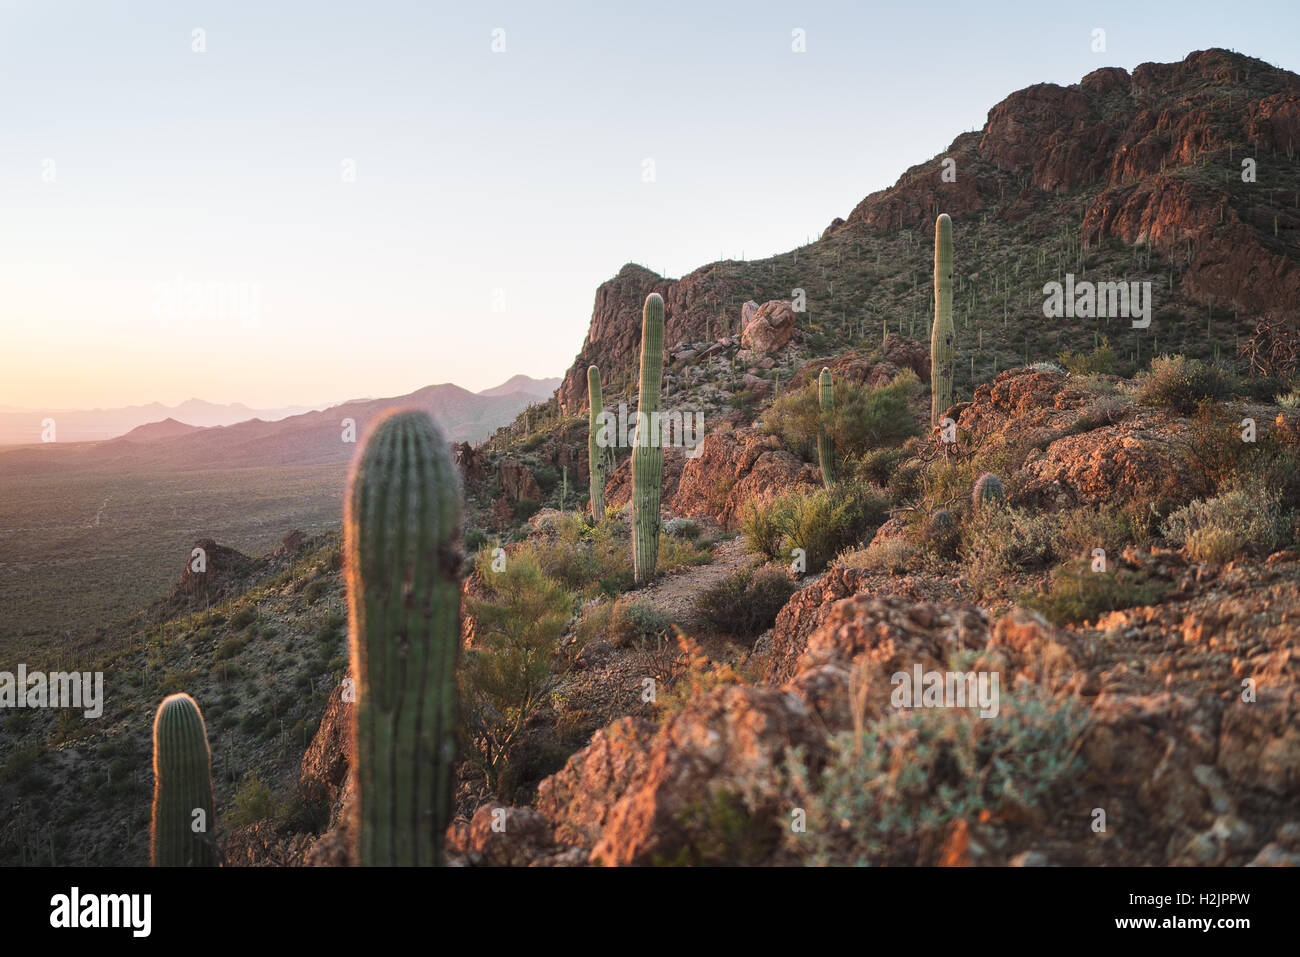 Evening light shines on the desert of Arizona's Saguaro National Park Stock Photo